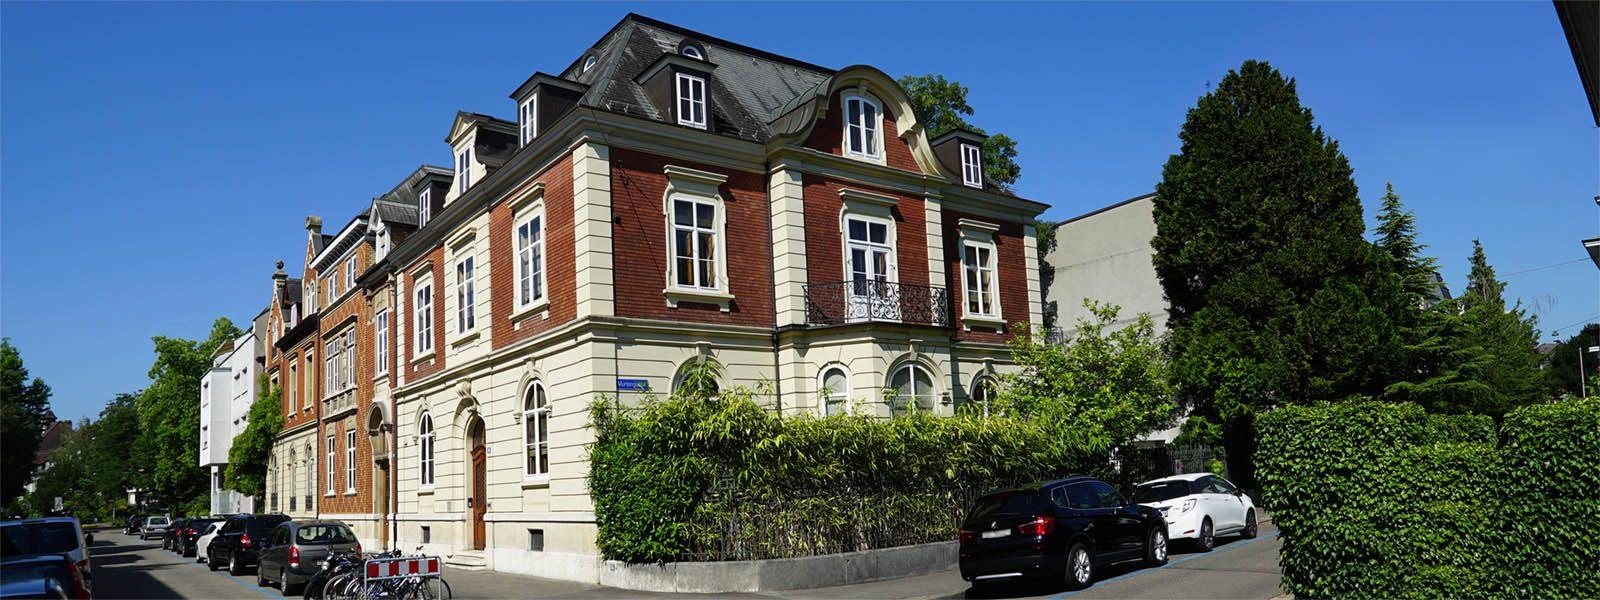 ADVOTECH ADVOKATEN Burgunderstrasse 36 Basel